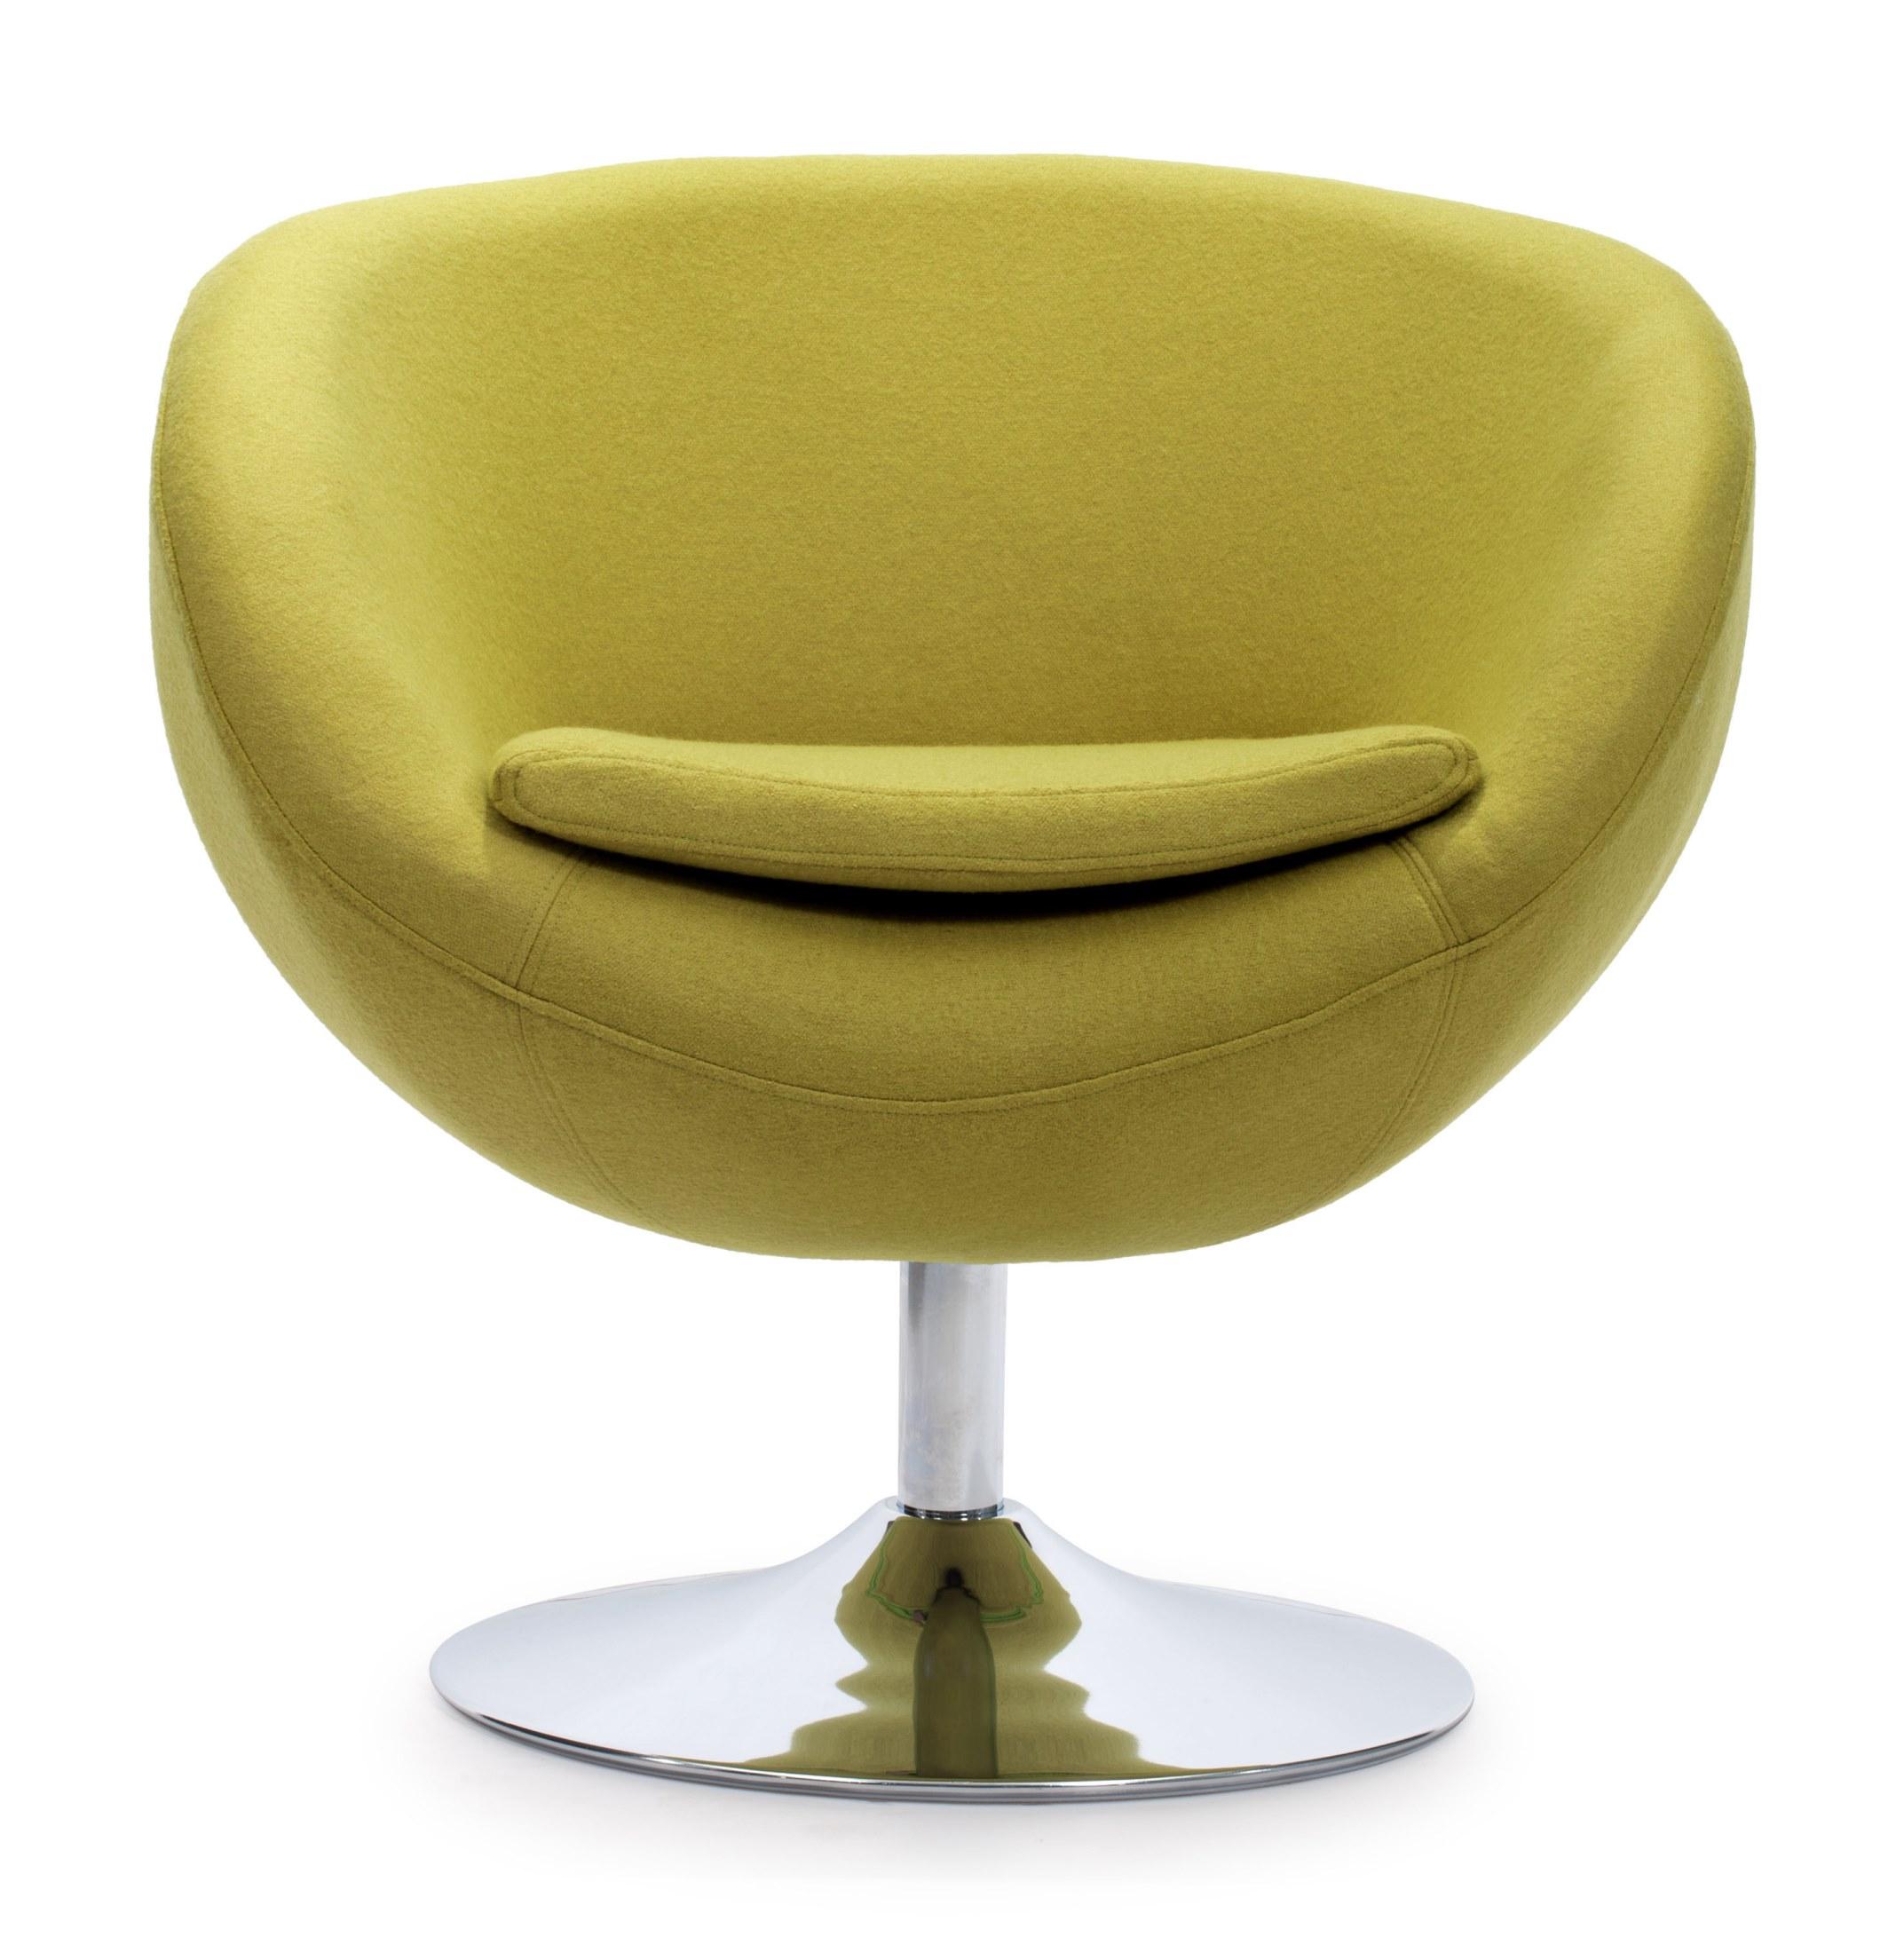 Pistachio Green Leather Sofa: Zuo Modern Lund Pistachio Green Arm Chair